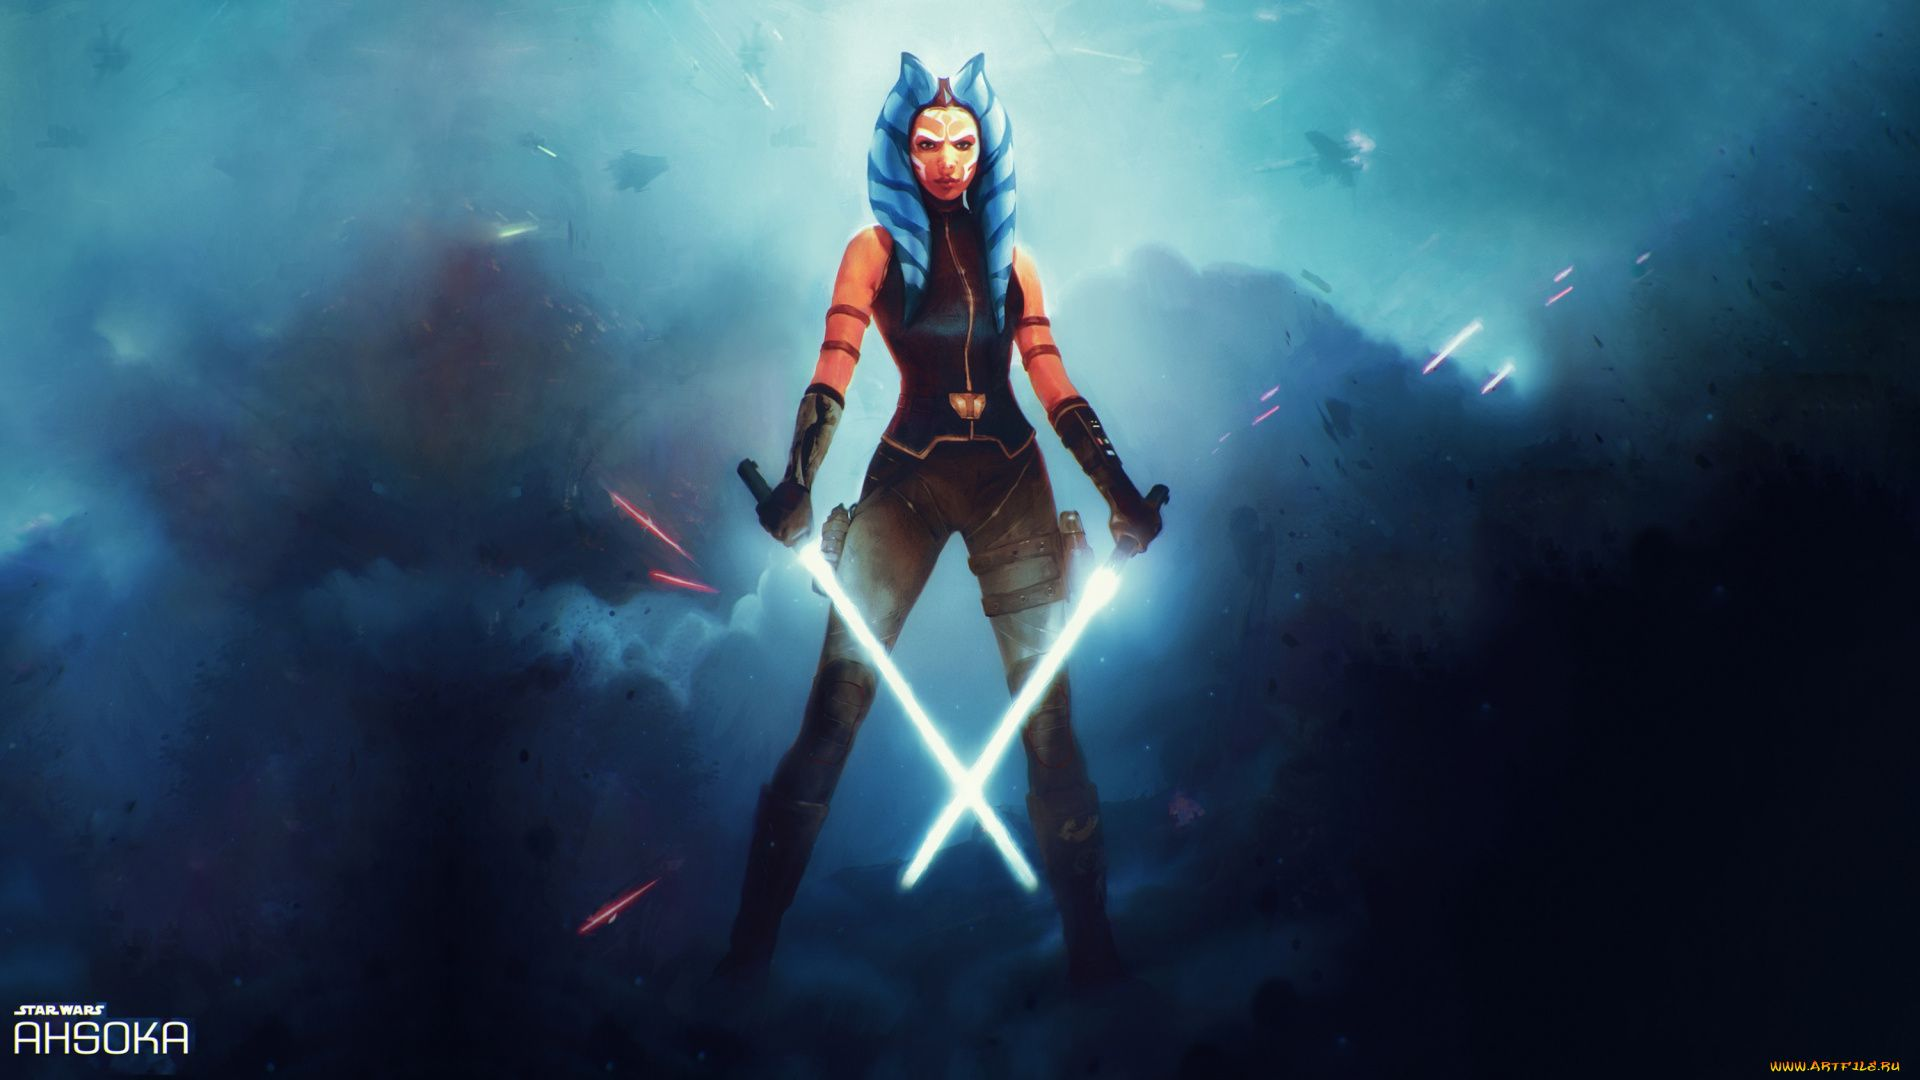 Star Wars Ahsoka 1